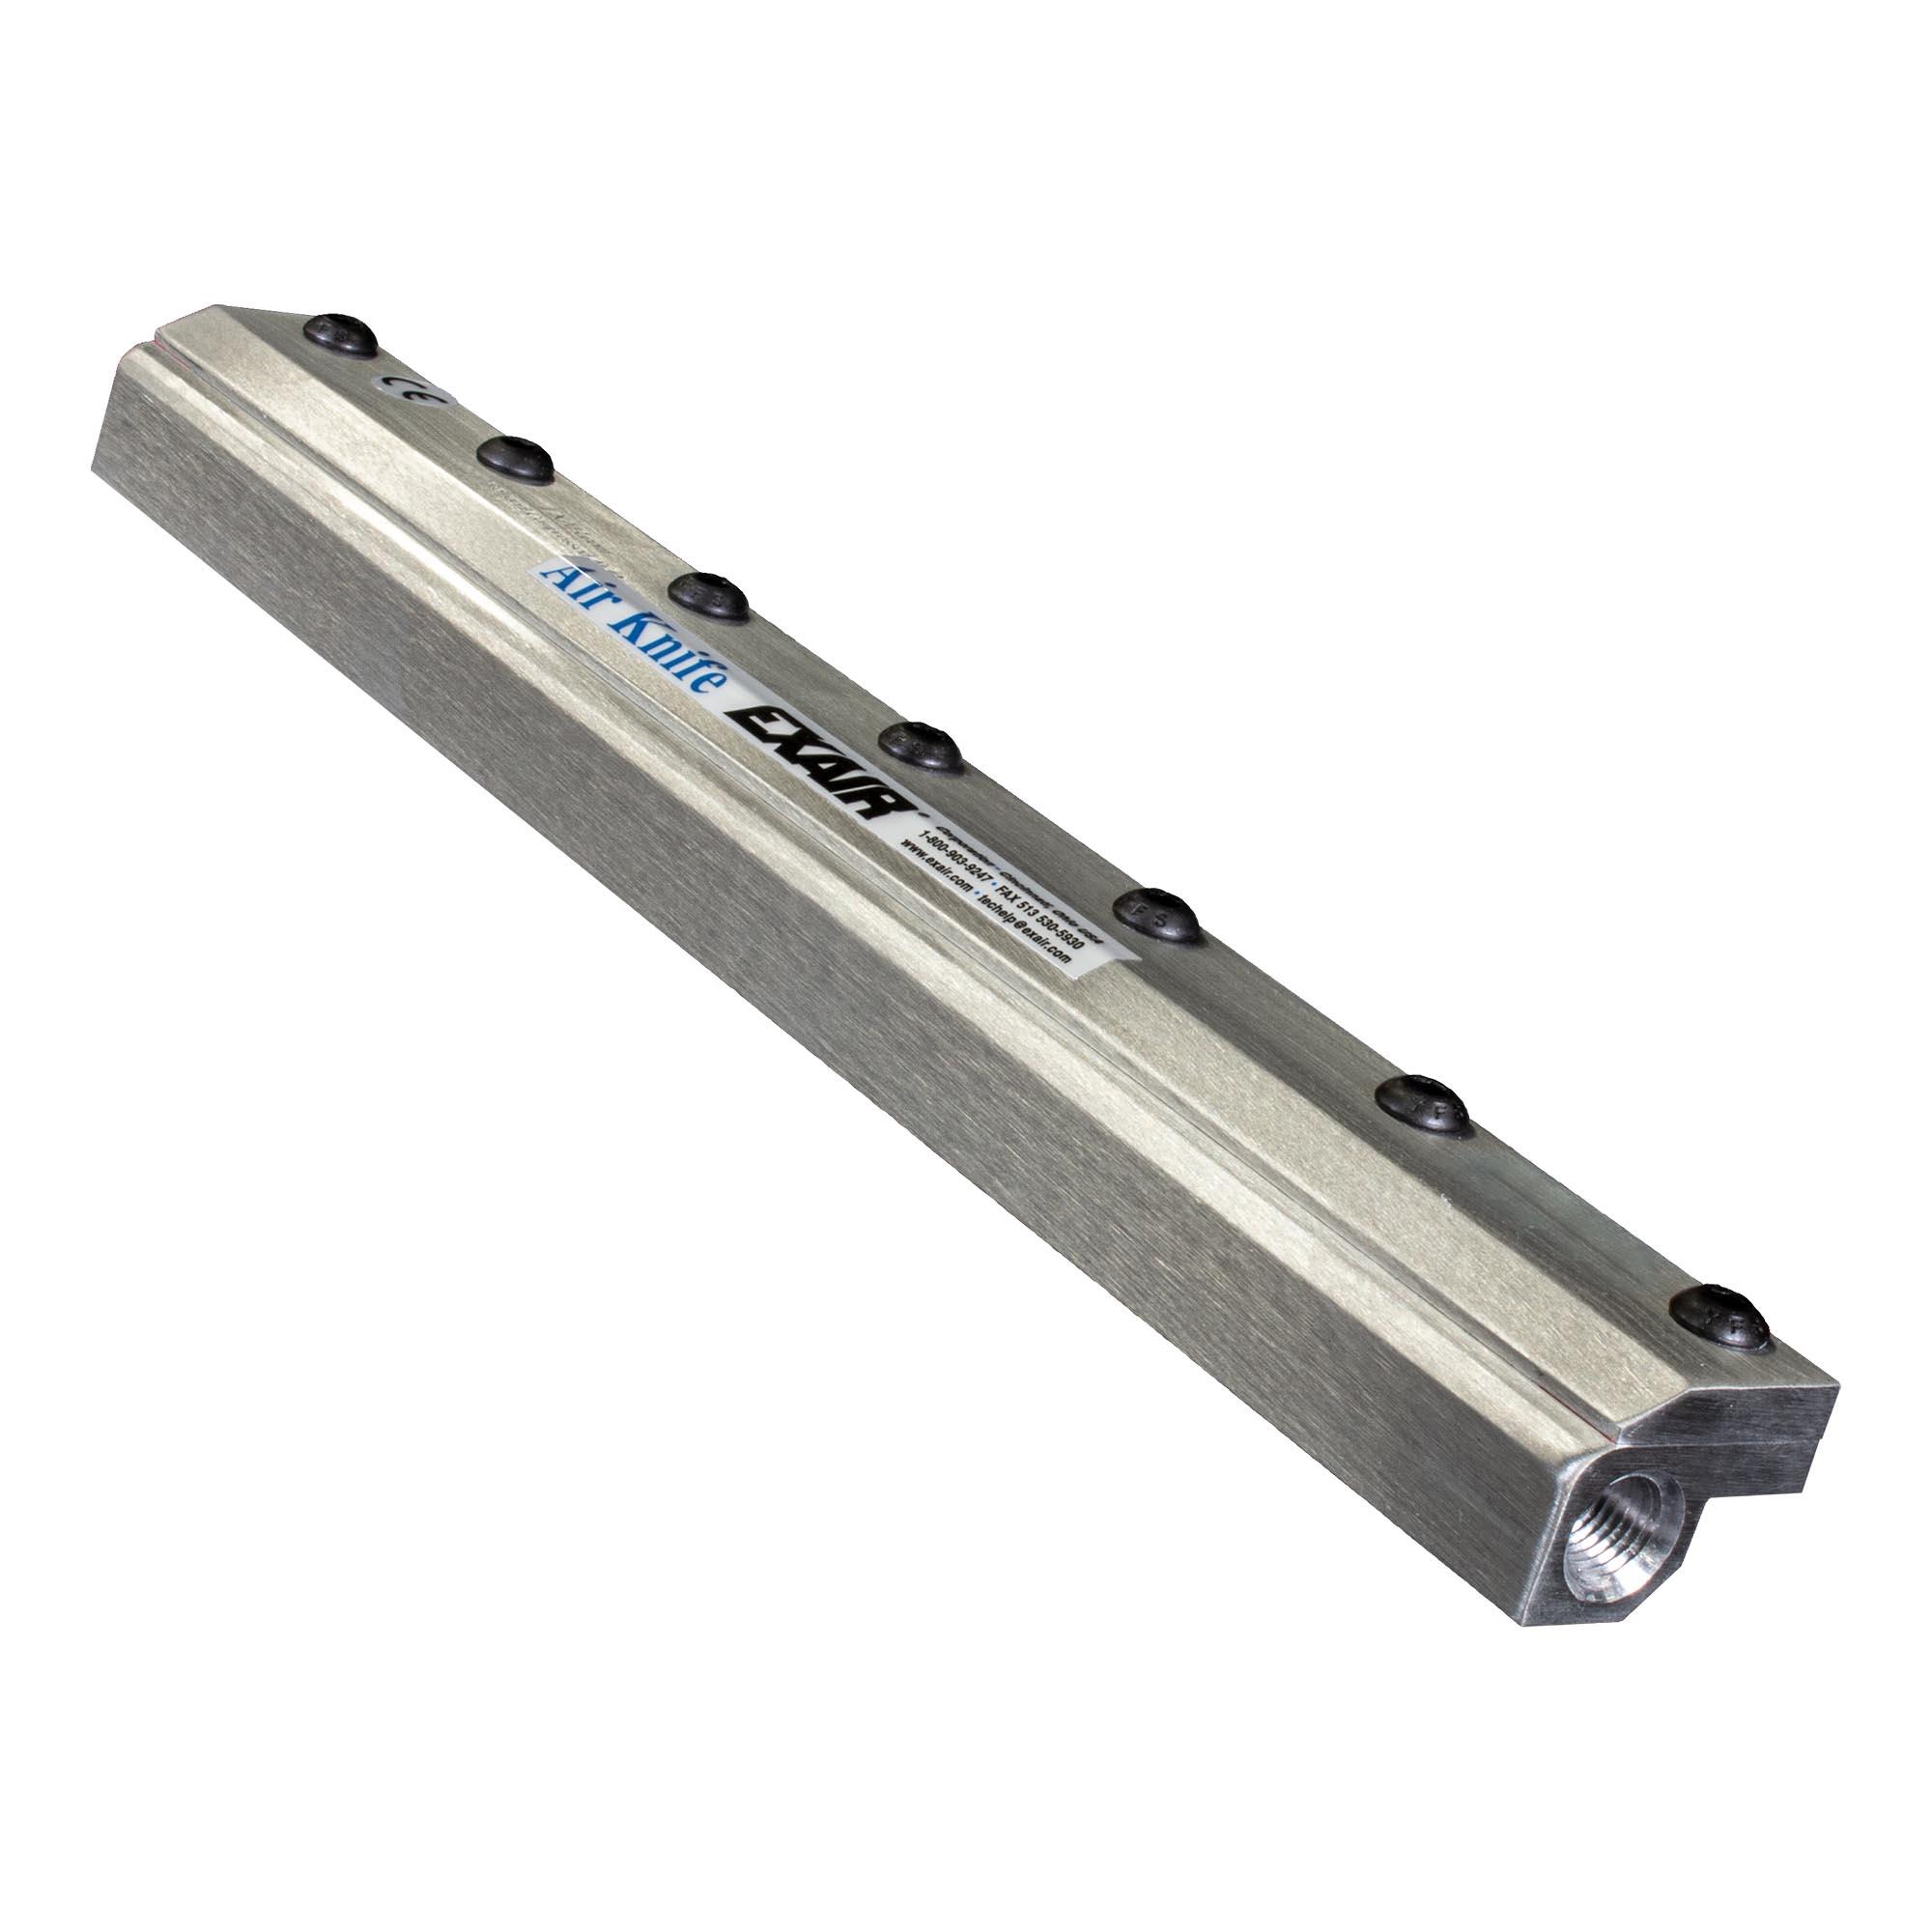 Stainless Steel Standard Air Knife